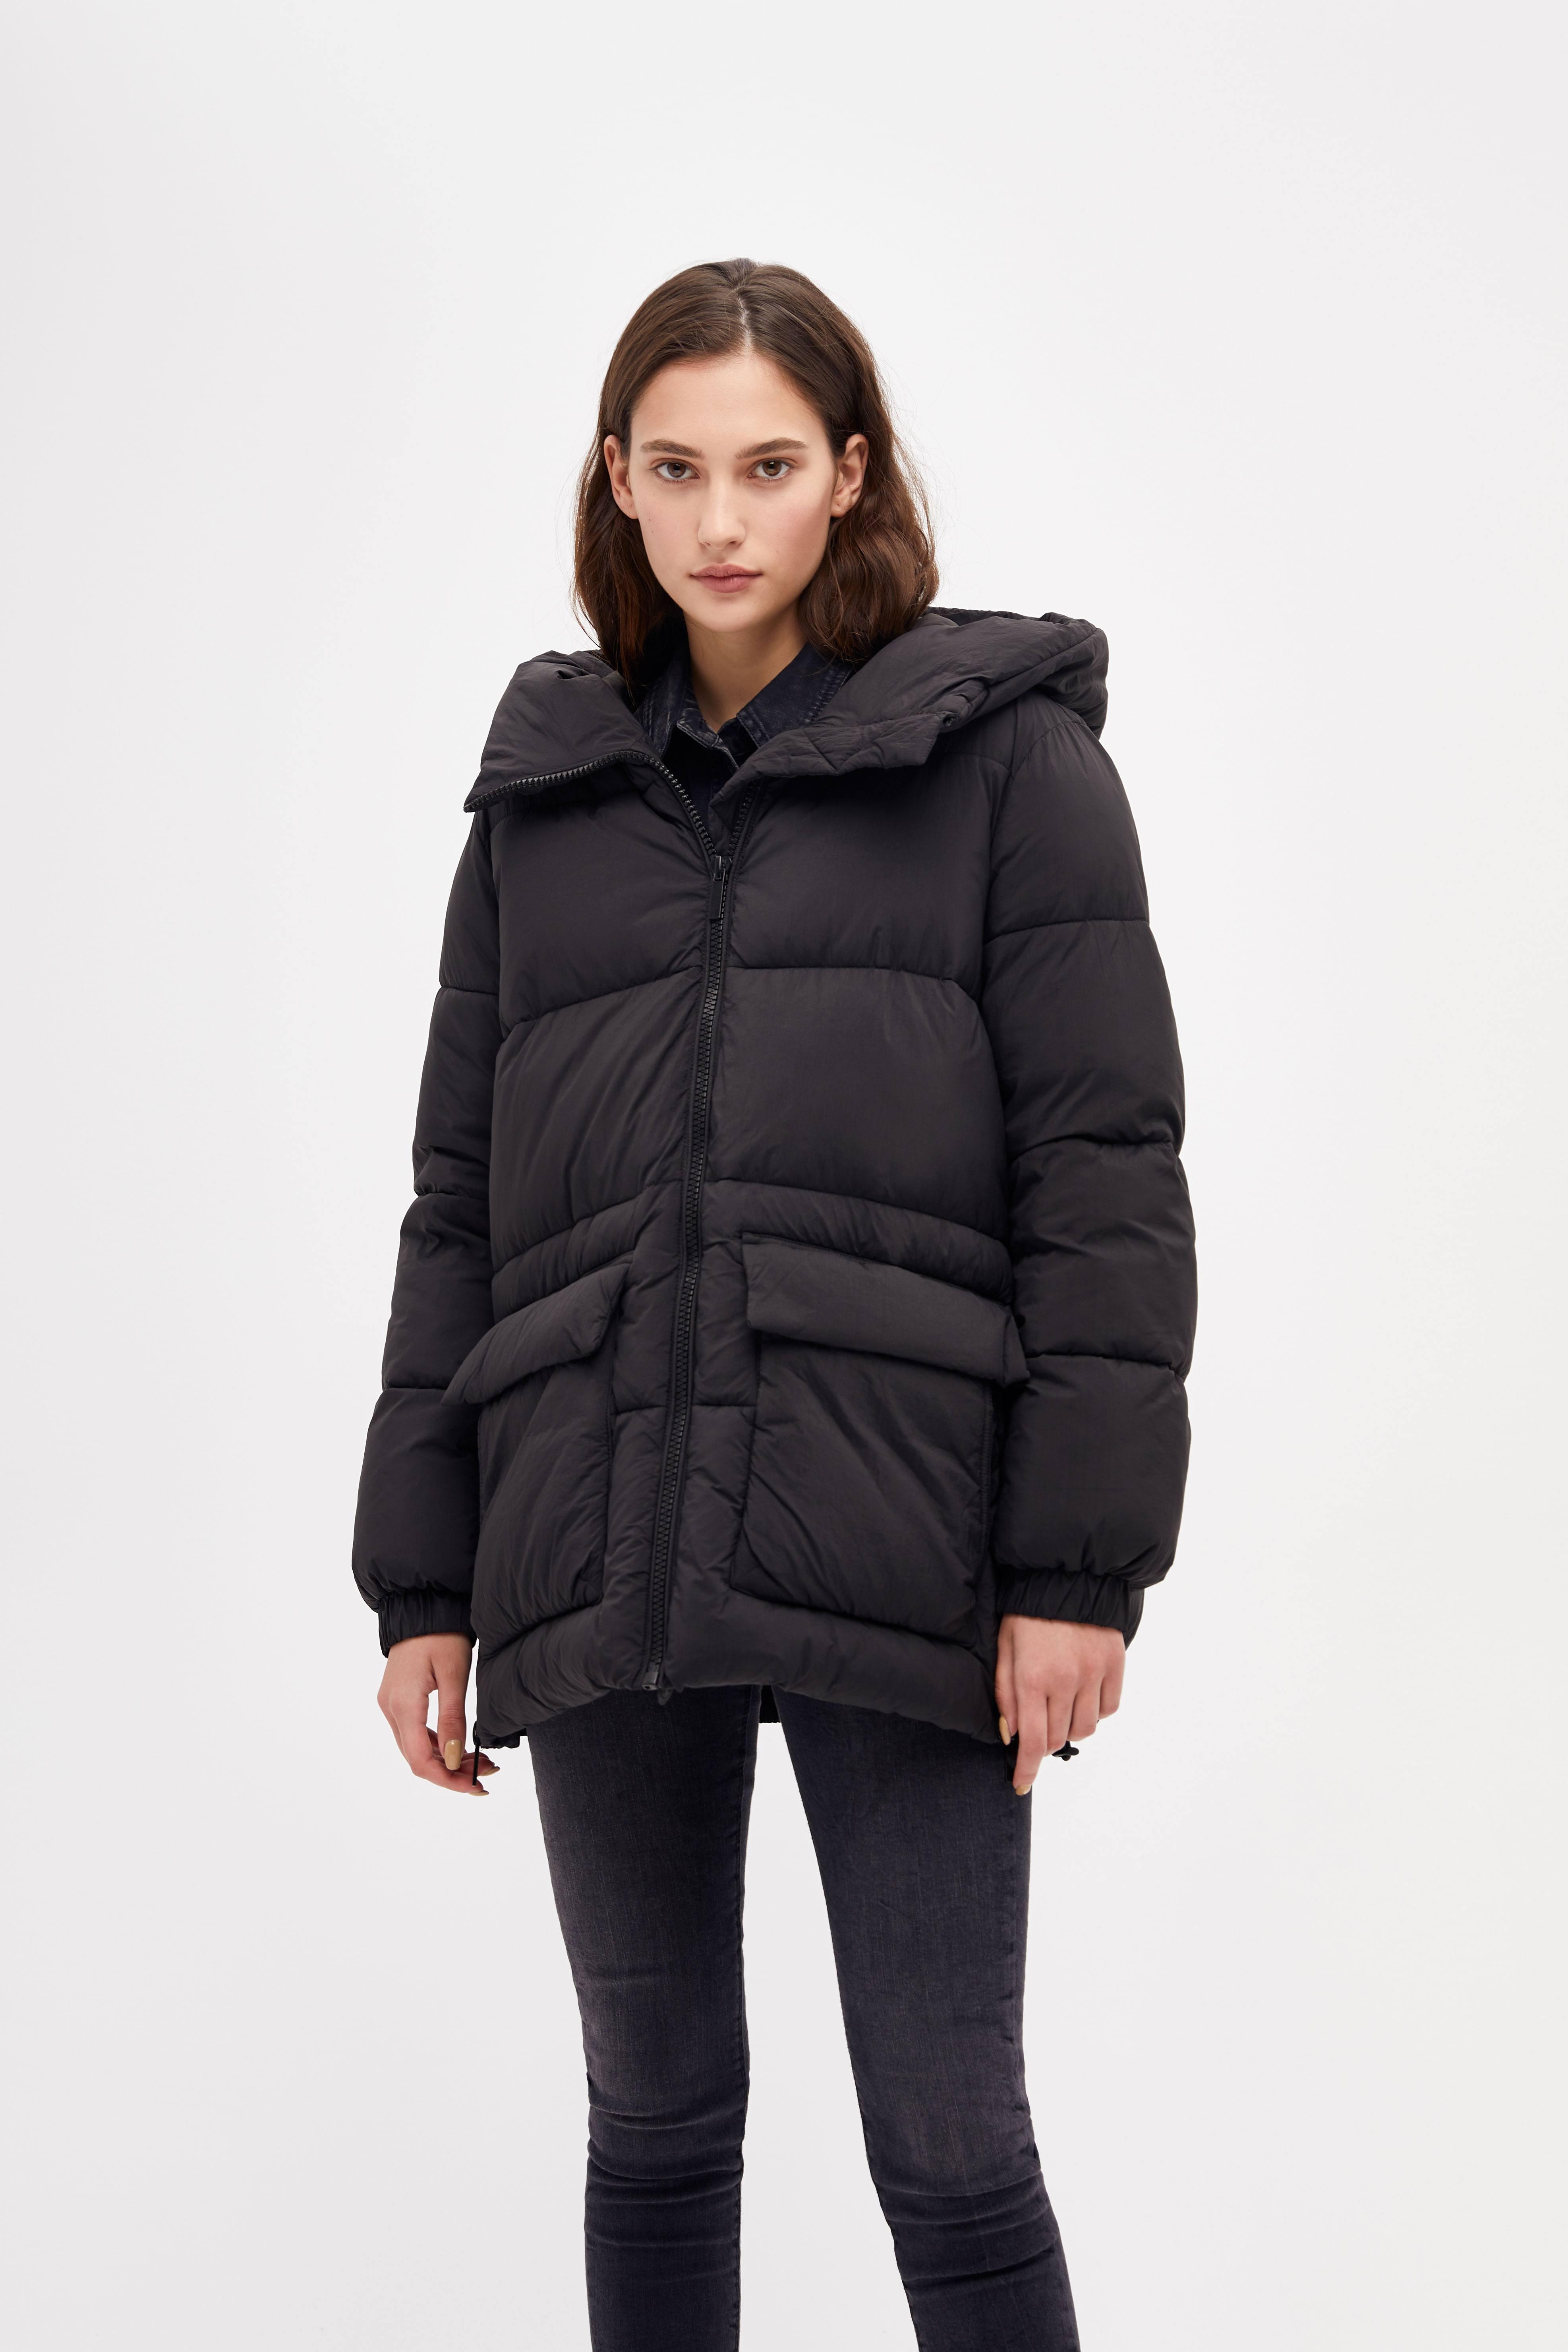 Куртка LIME Куртка с объемным капюшоном куртка с капюшоном черная in extenso